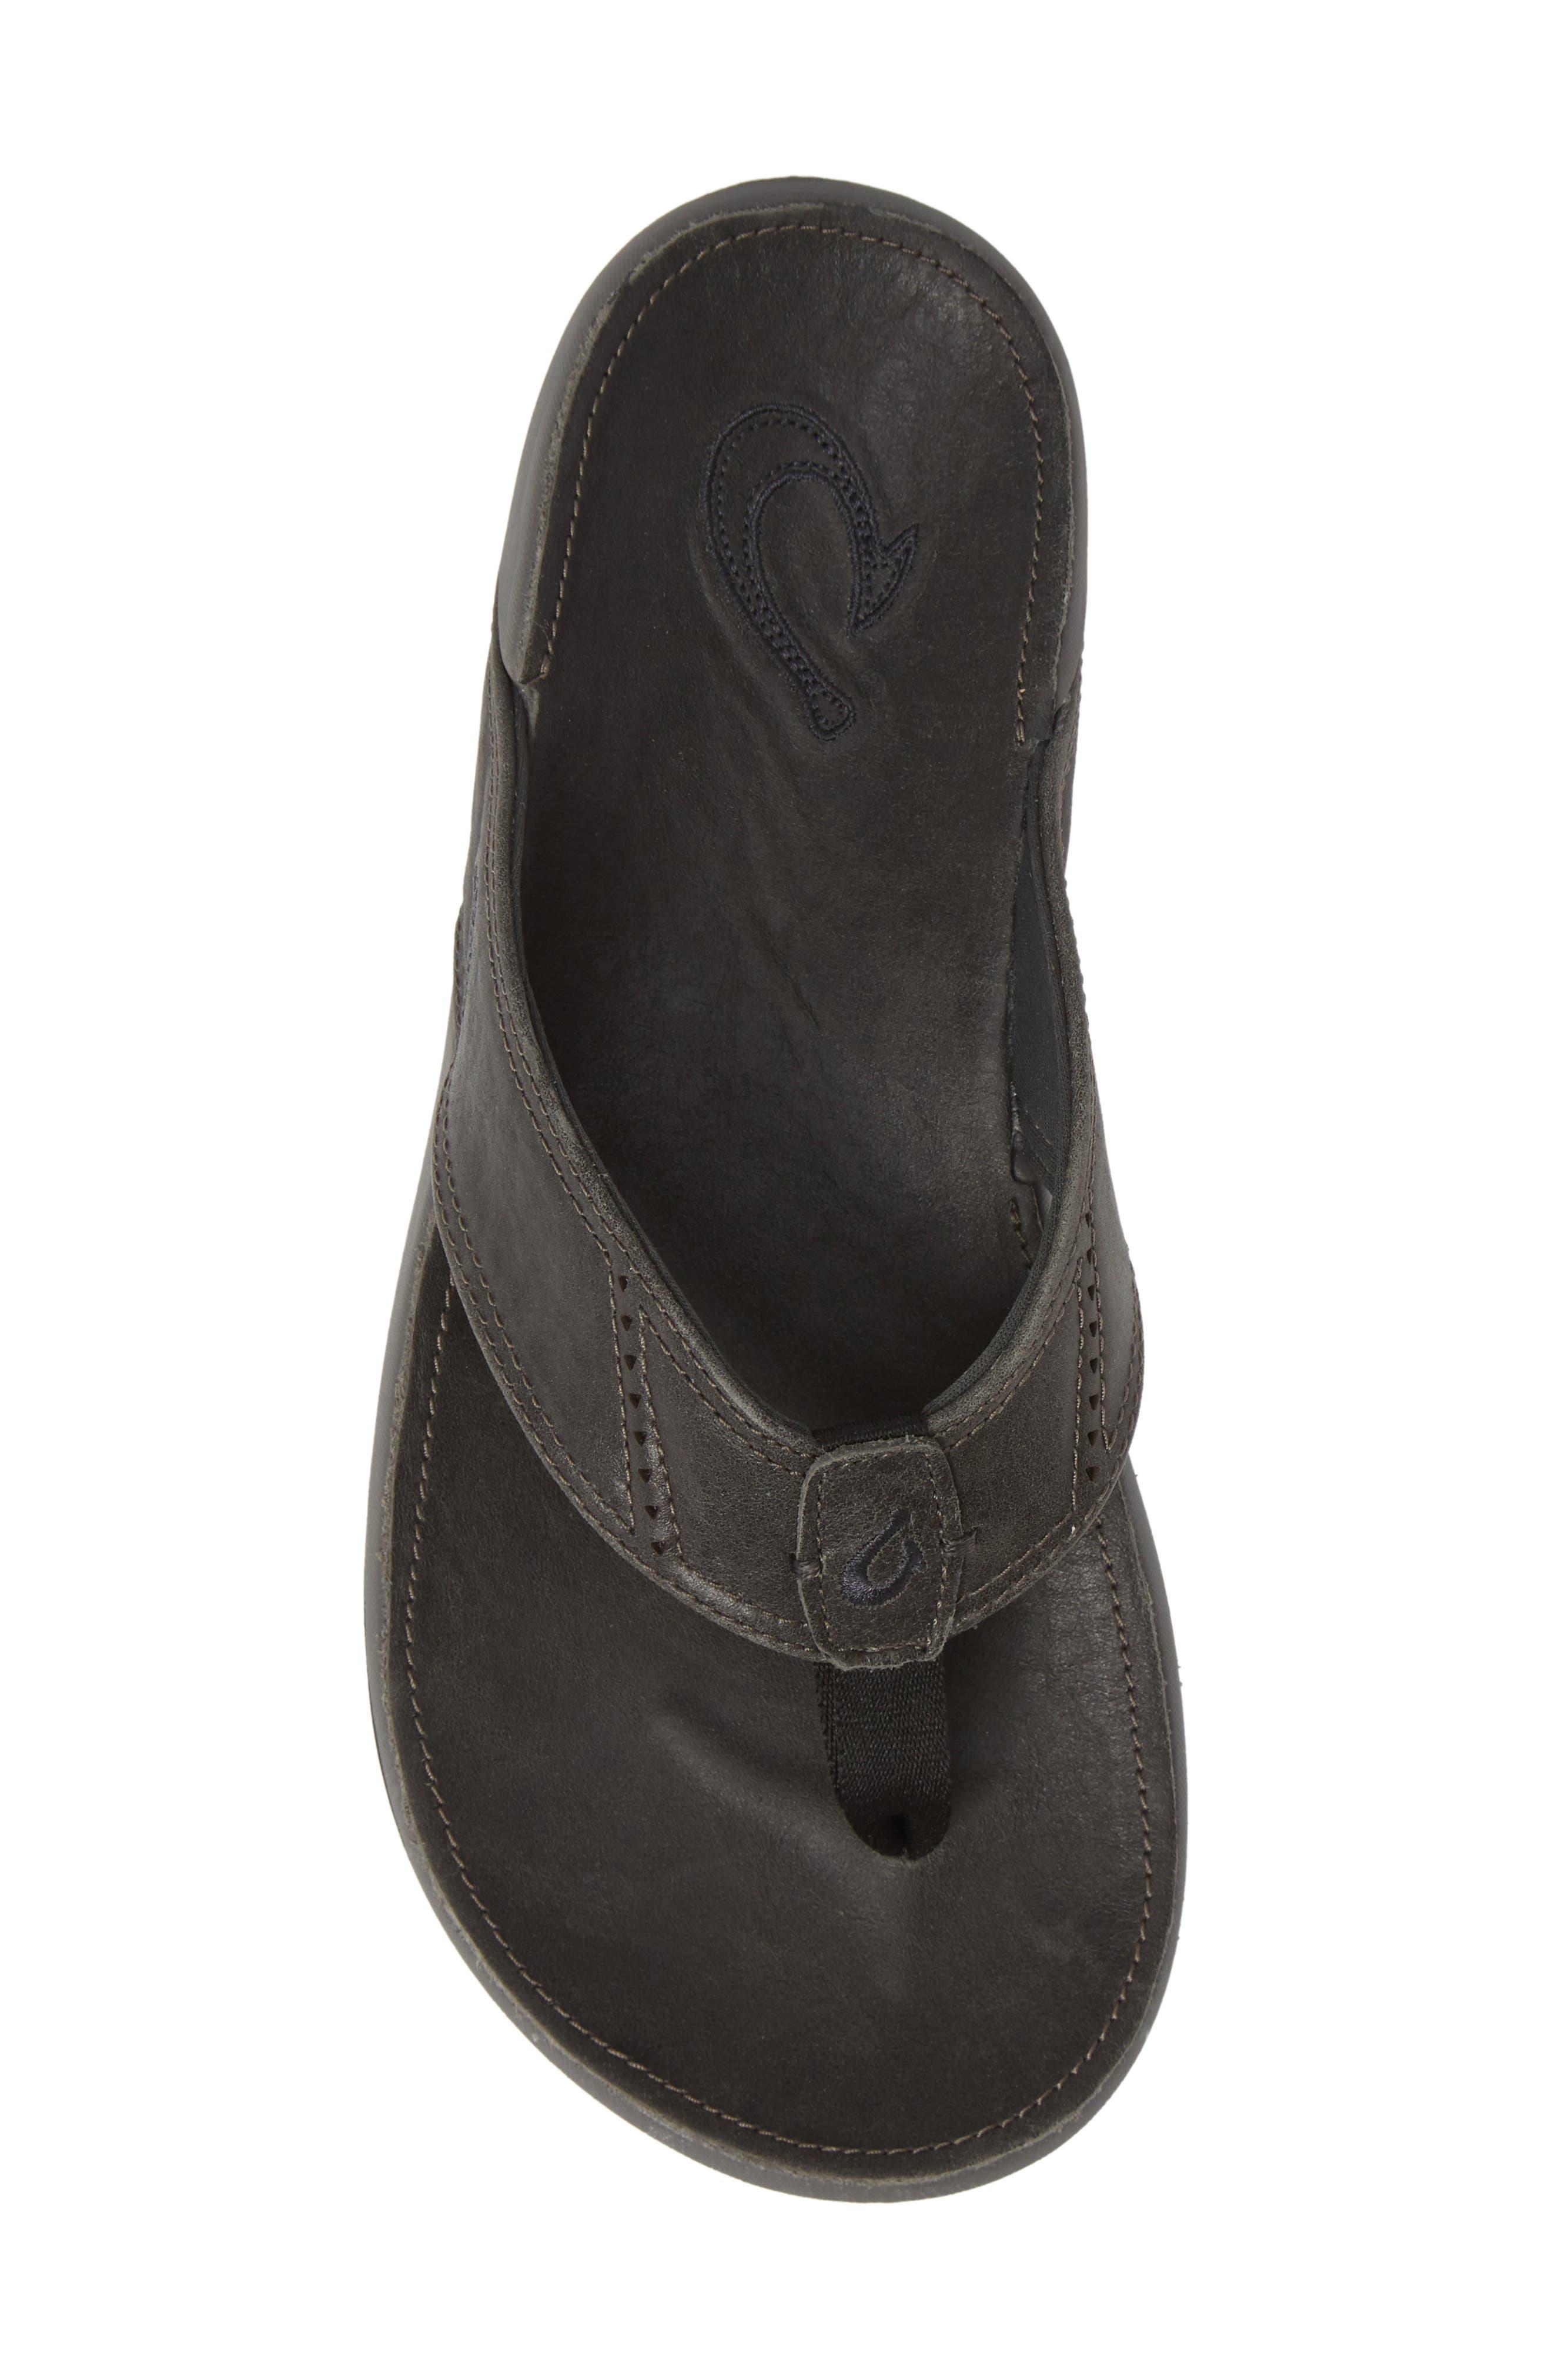 OLUKAI,                             'Nui' Leather Flip Flop,                             Alternate thumbnail 5, color,                             LAVA ROCK LEATHER